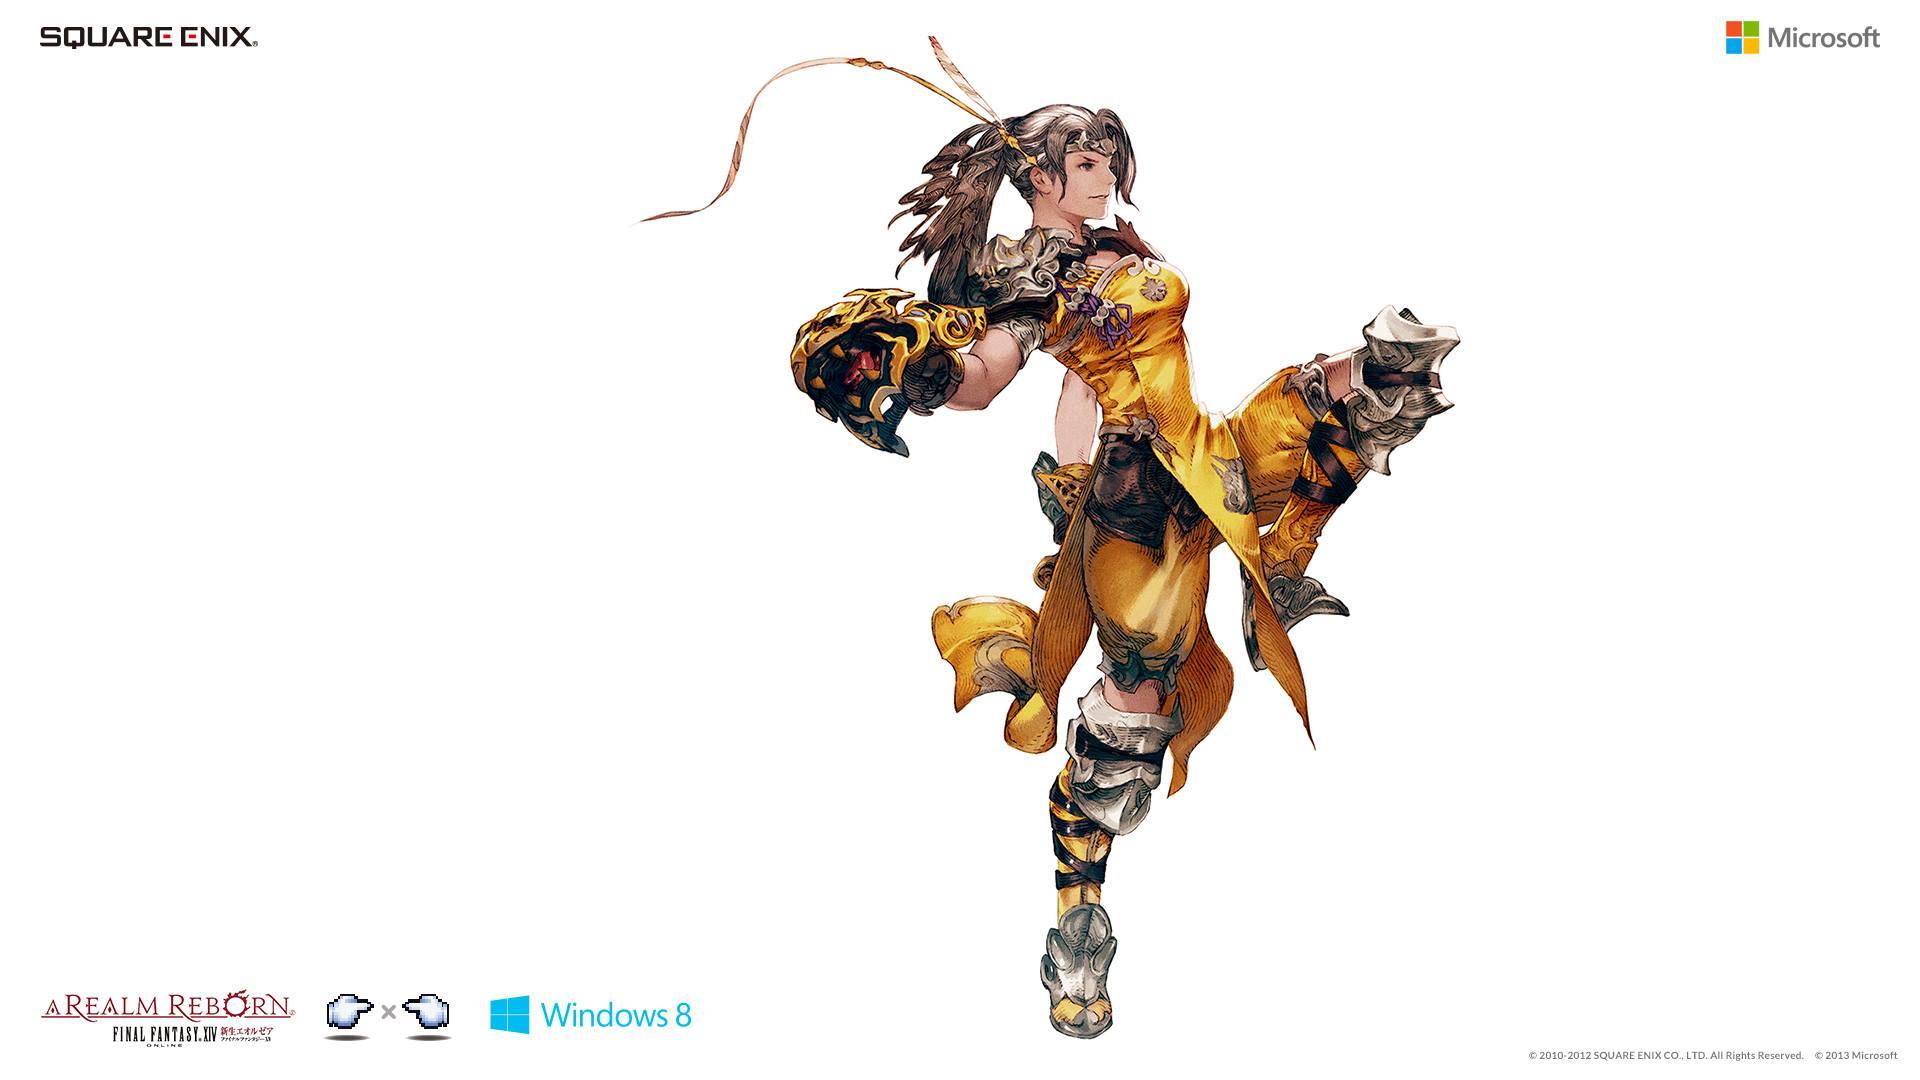 Final Fantasy Xiv A Realm Reborn Fantasy Art Wallpapers: Final Fantasy XIV Wallpapers